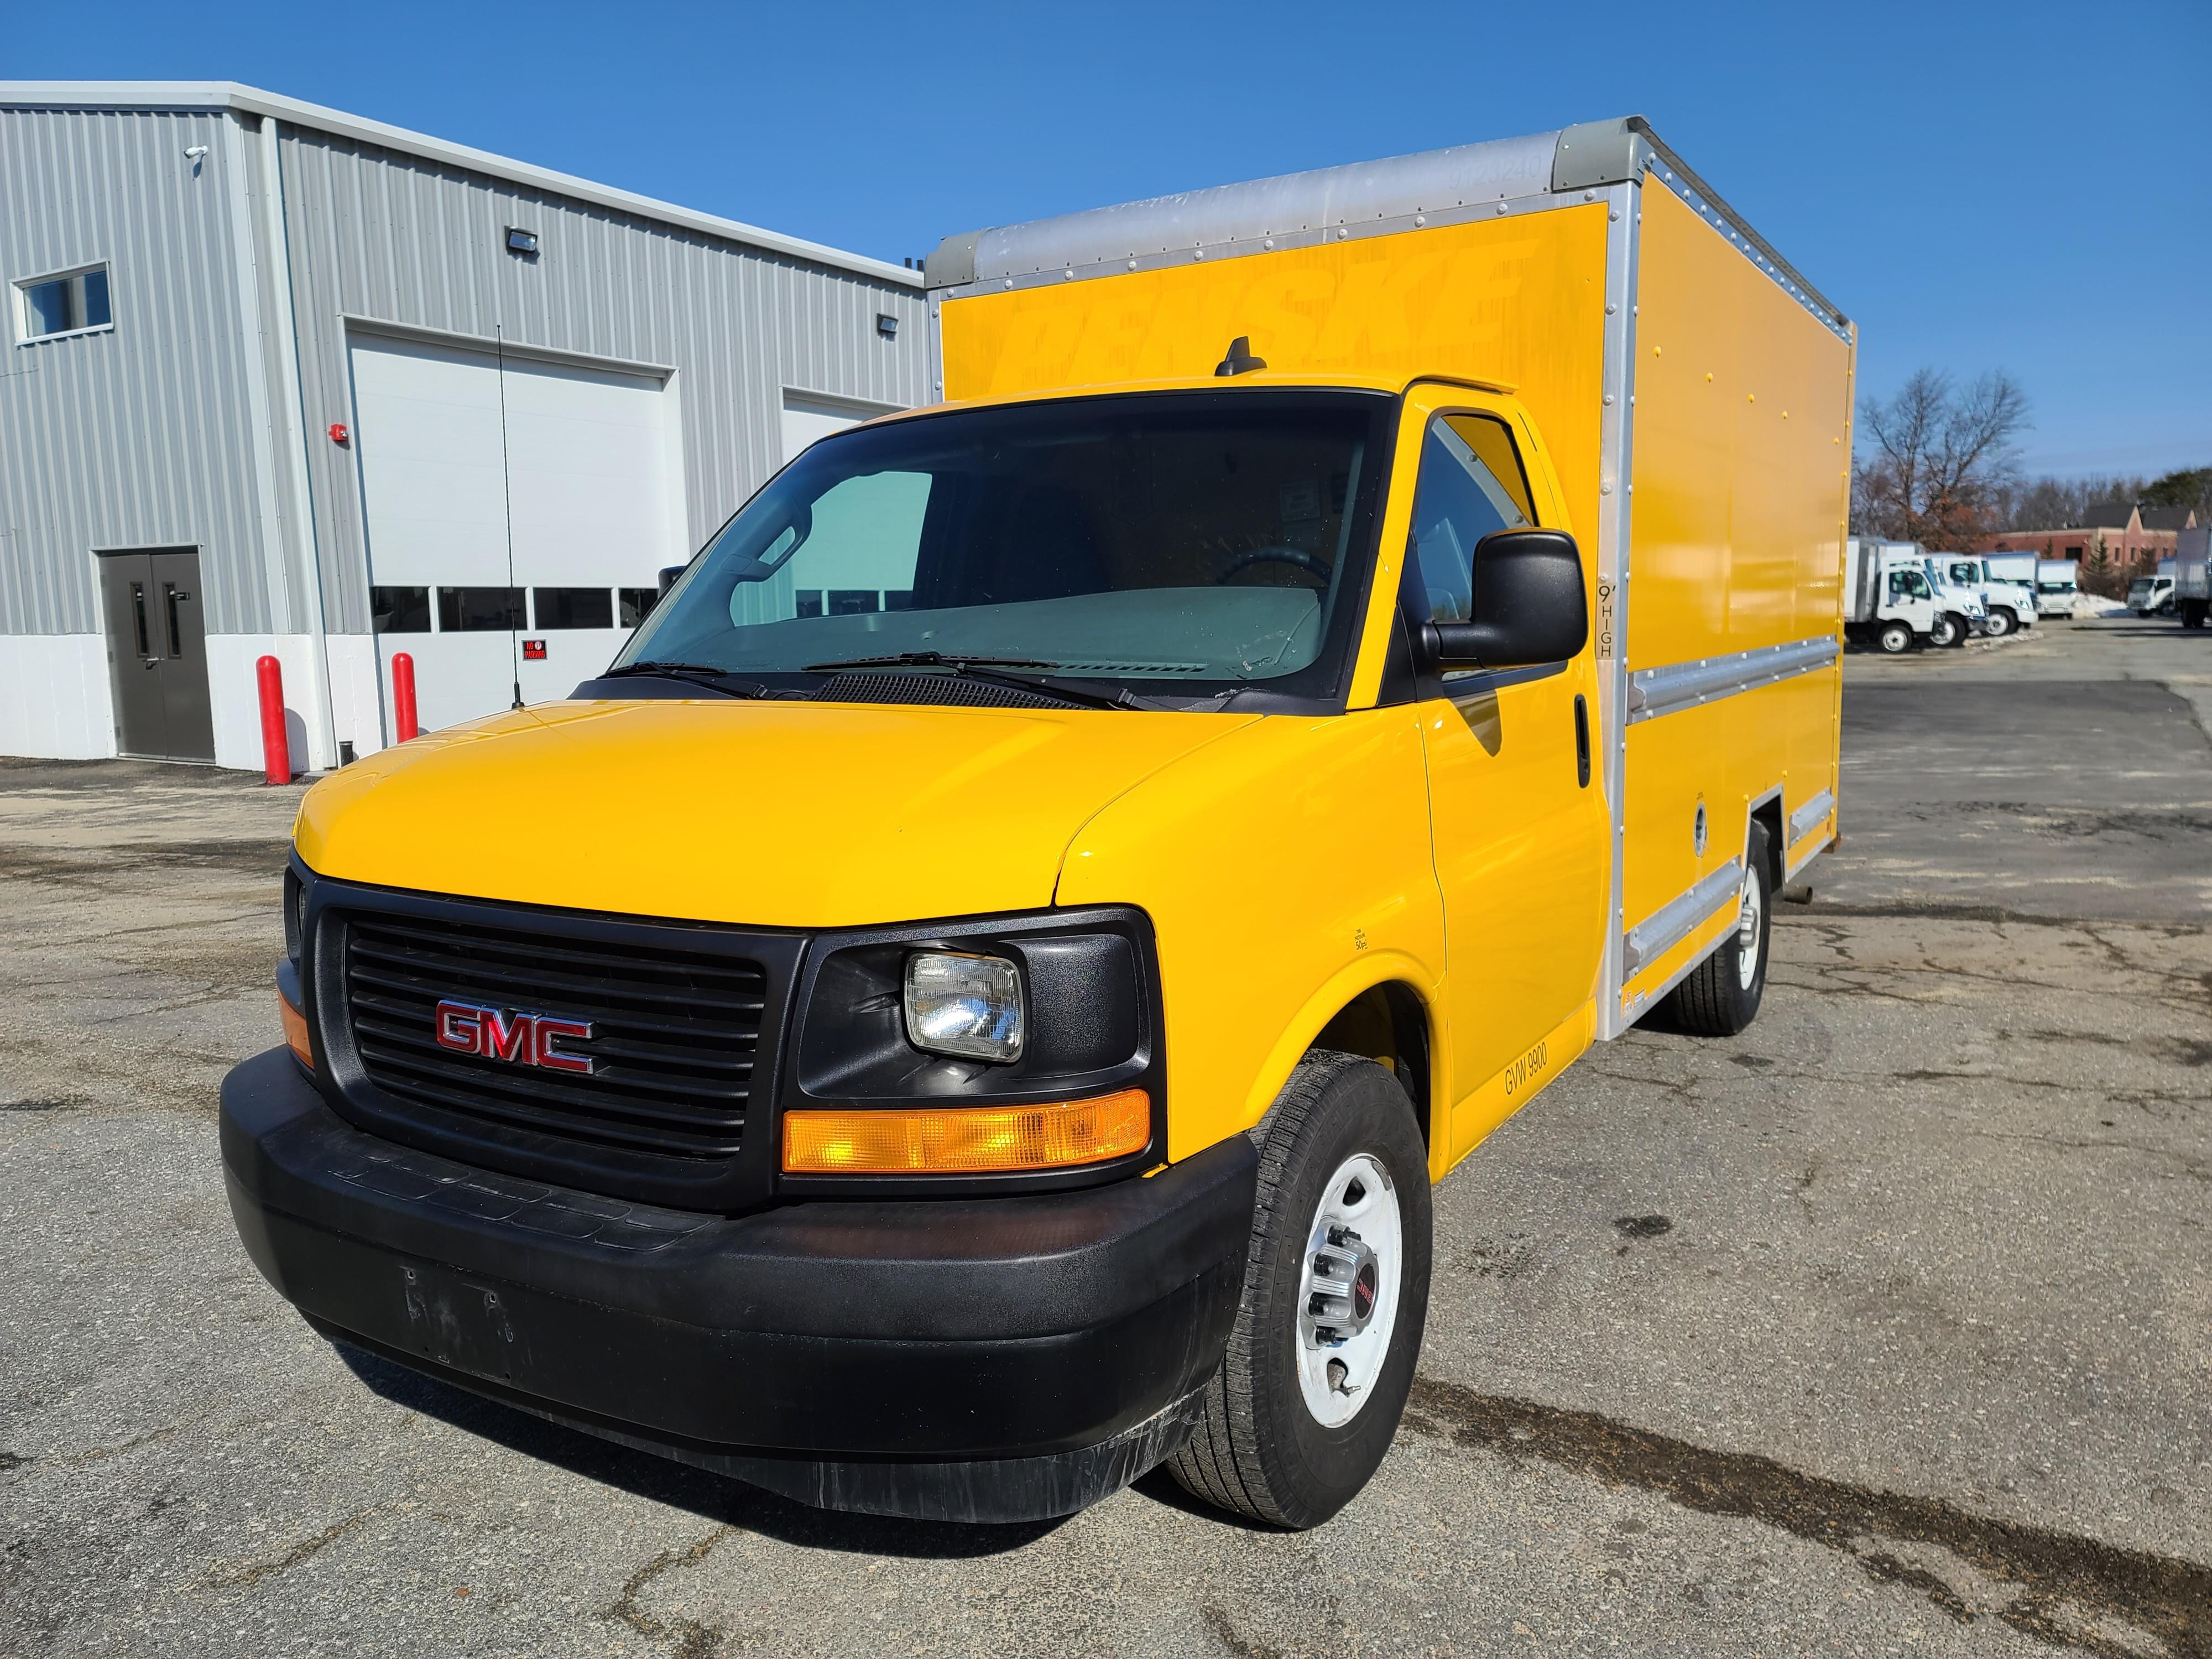 Used, 2017, GMC, Savana 3500 Cutaway Regular, Cab / Chassis Trucks